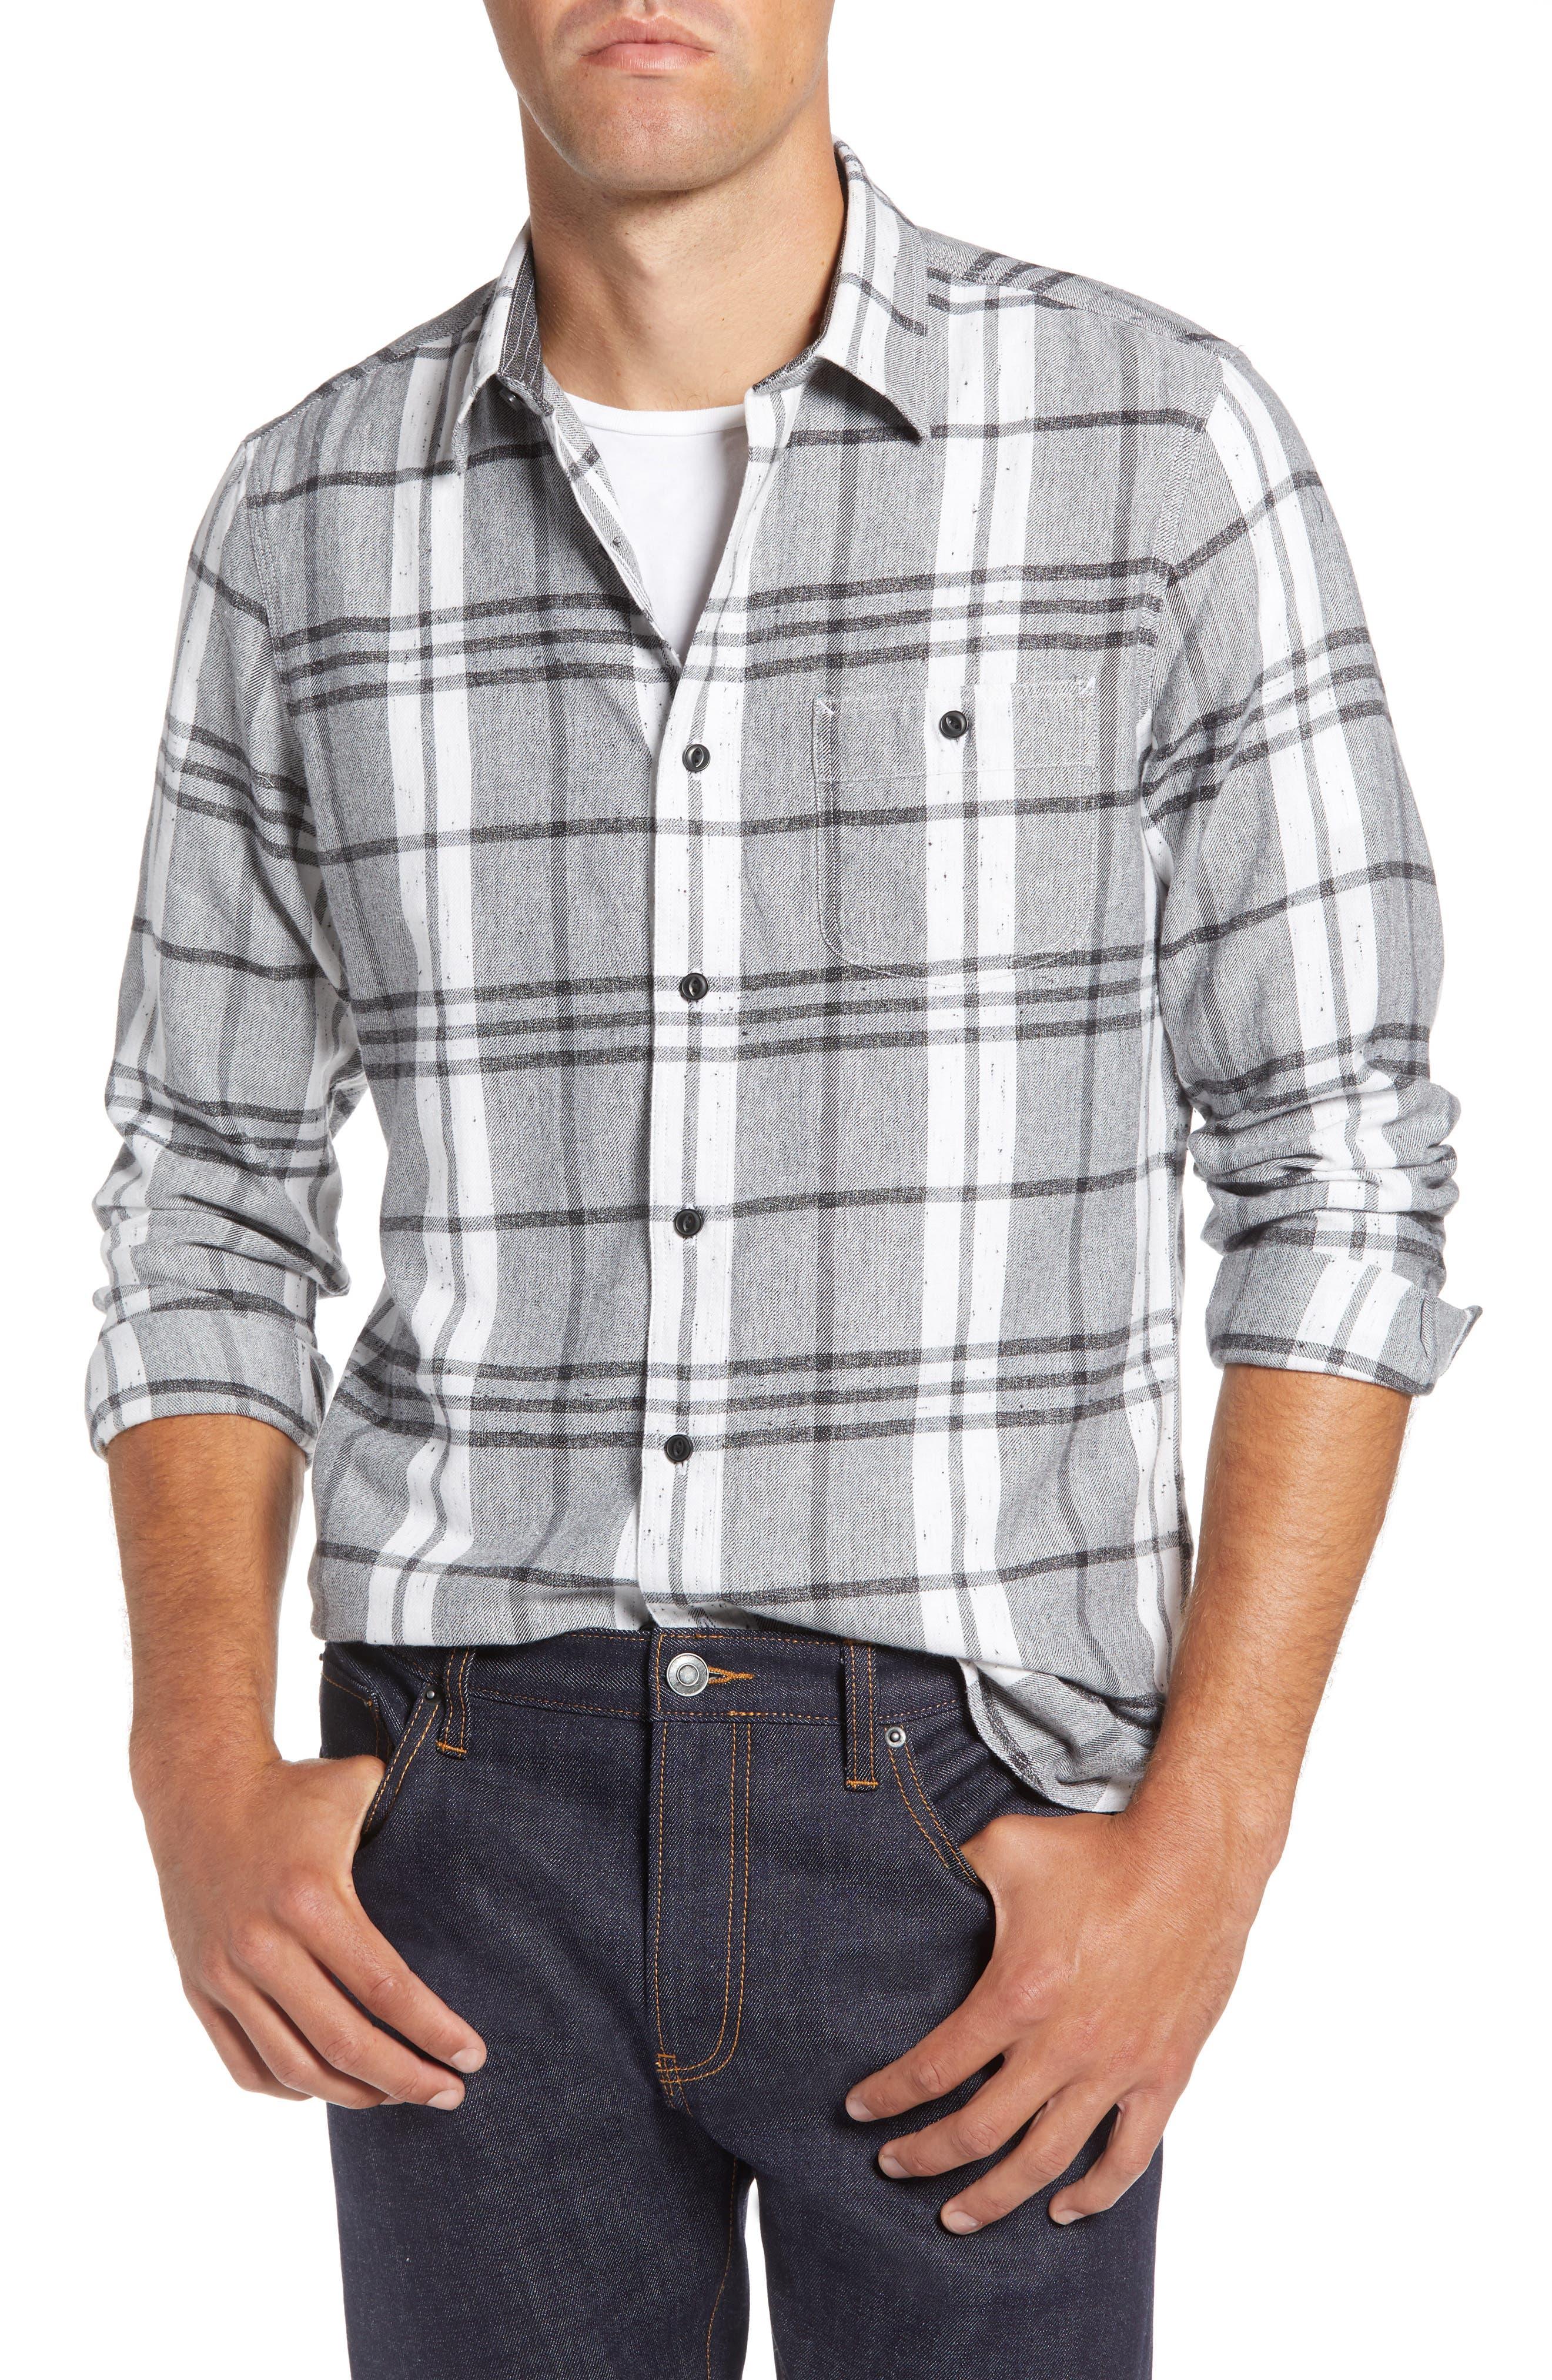 Trim Fit Brushed Plaid Utility Shirt,                             Main thumbnail 1, color,                             GREY CASTLEROCK NEP PLAID